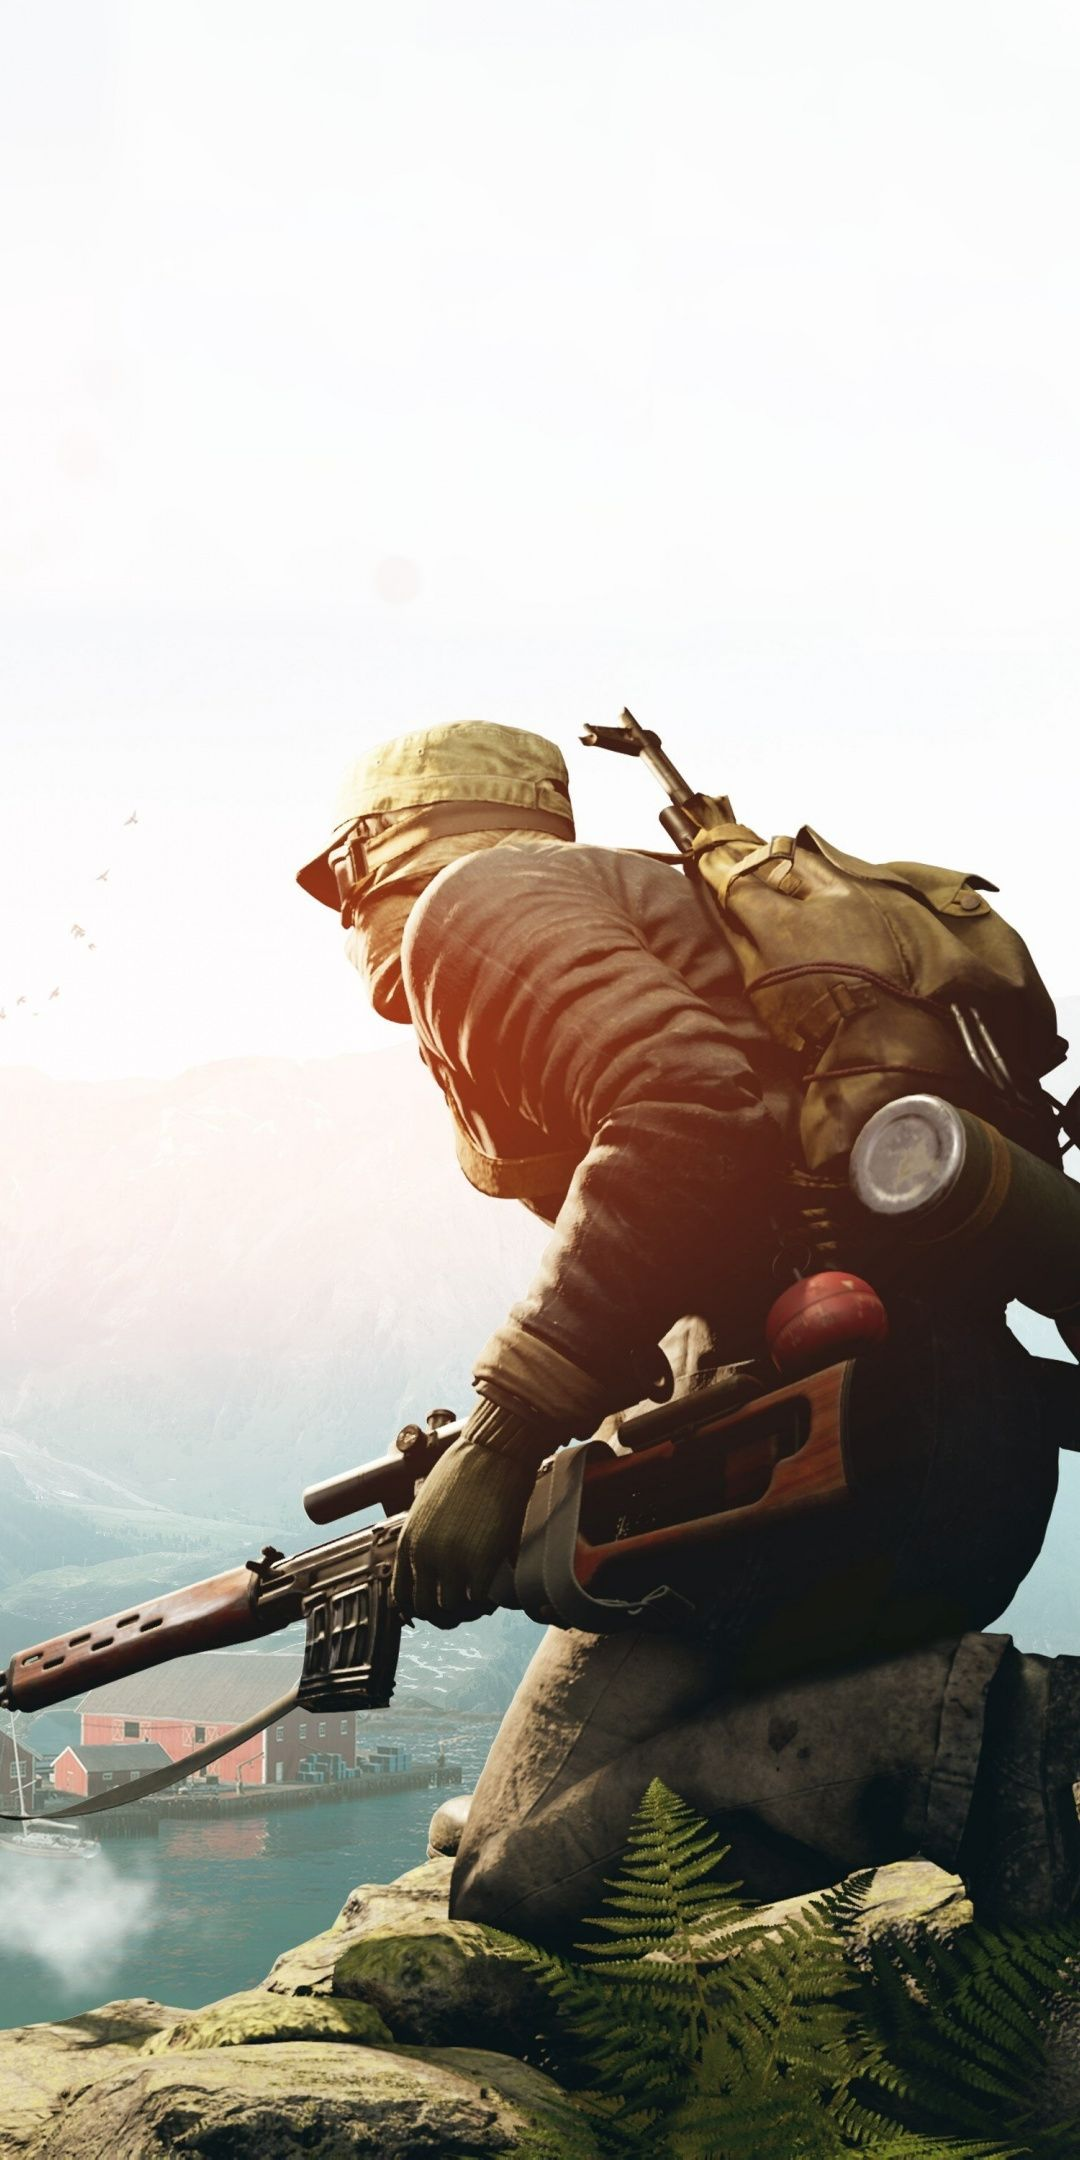 Soldier Vigor 2018 Survival Game 1080x2160 Wallpaper Survival Games Best Gaming Wallpapers Gaming Wallpapers